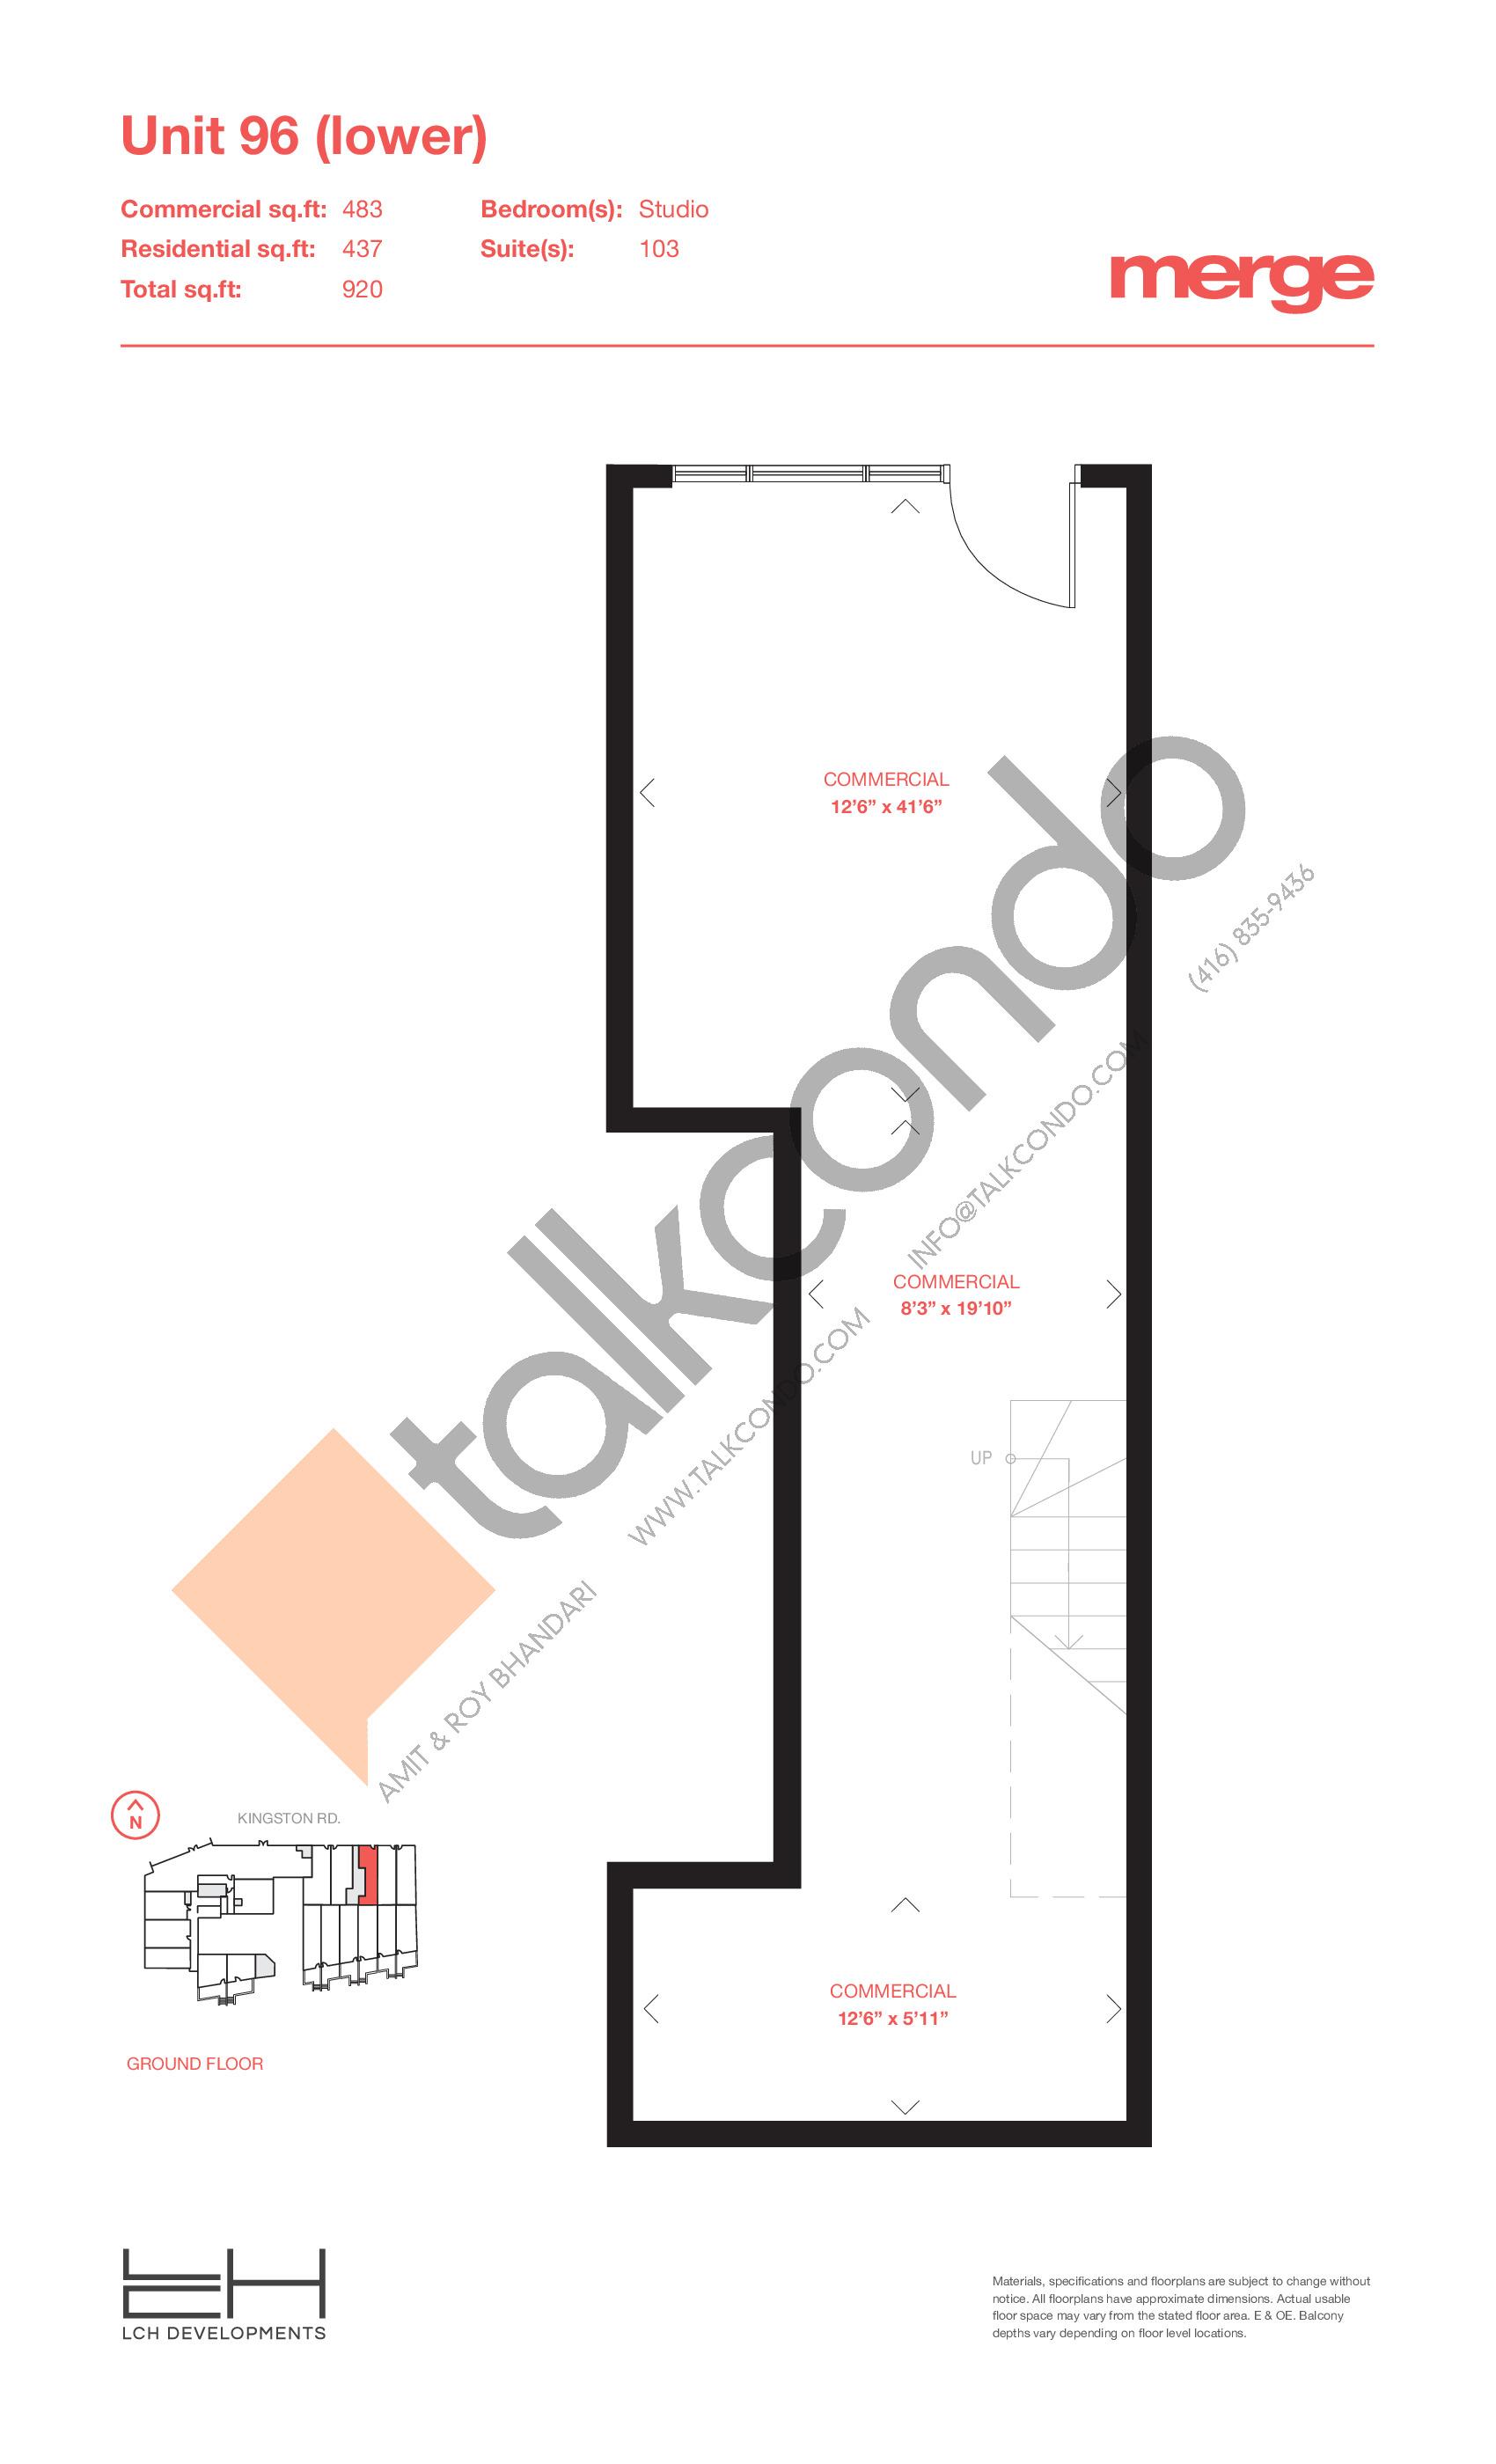 Unit 96 (Lower) - Livework Floor Plan at Merge Condos - 920 sq.ft